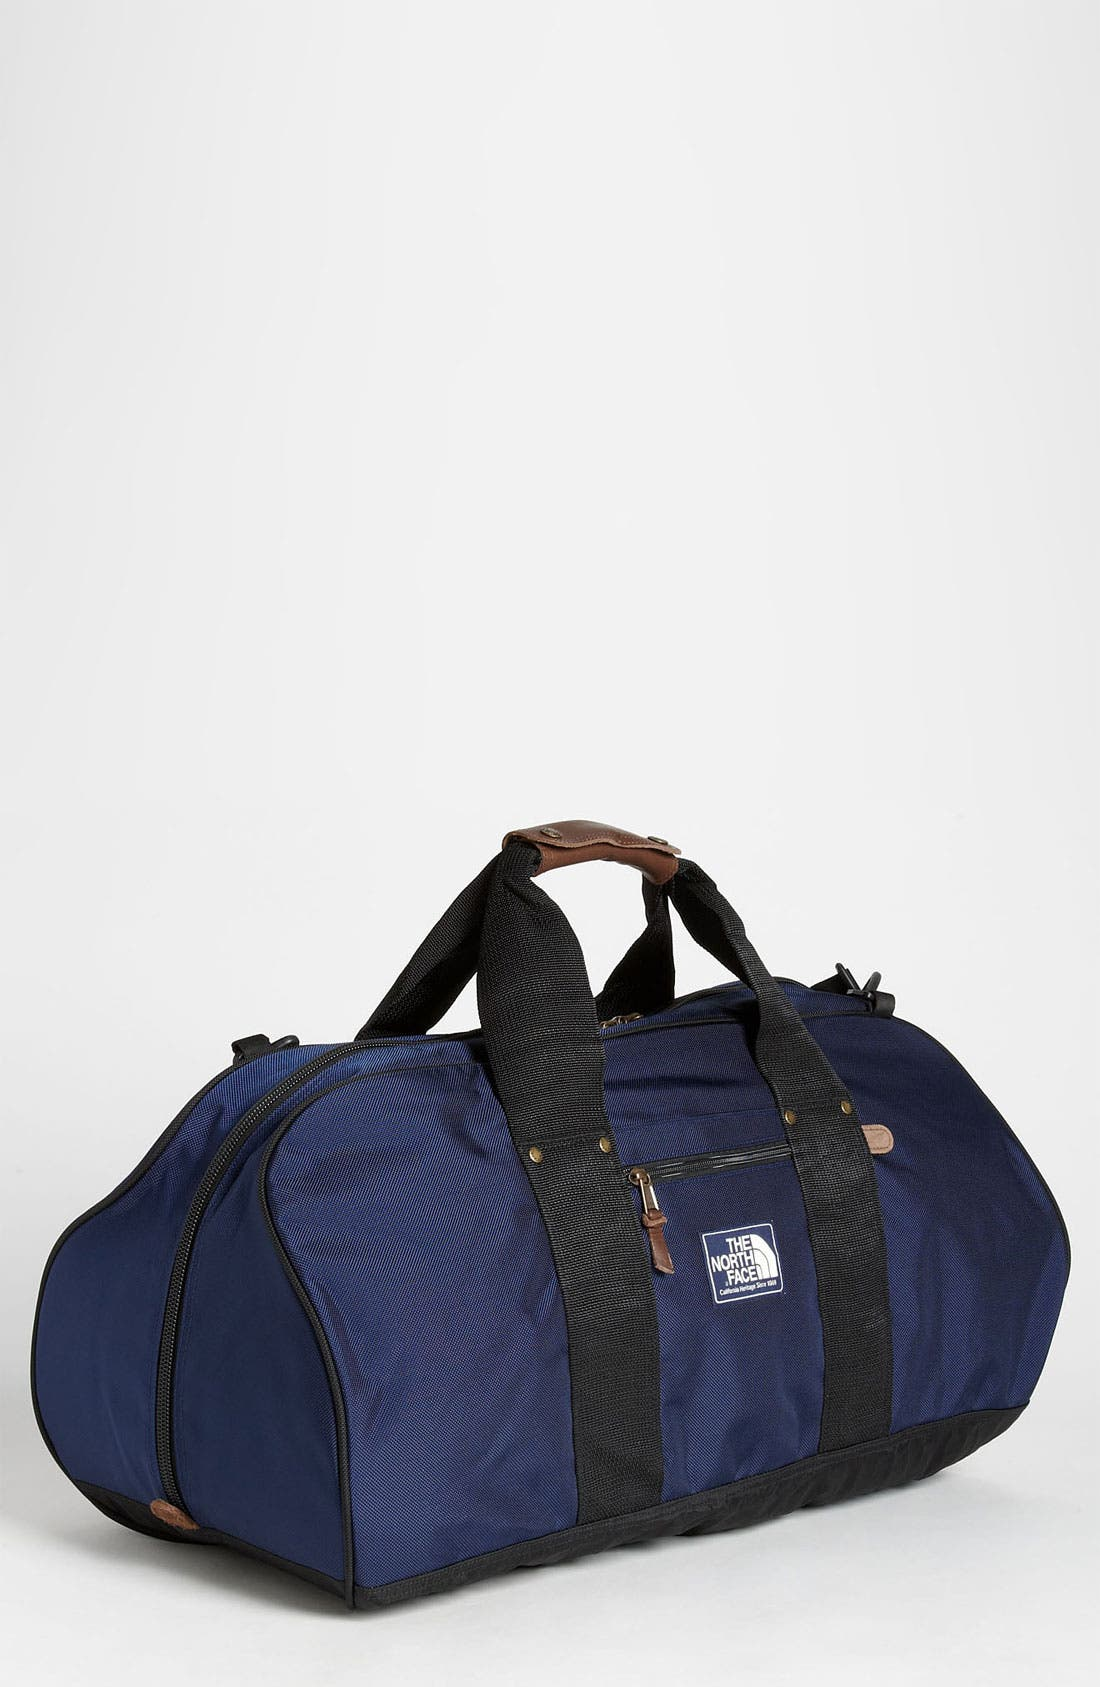 Main Image - The North Face Duffel Bag